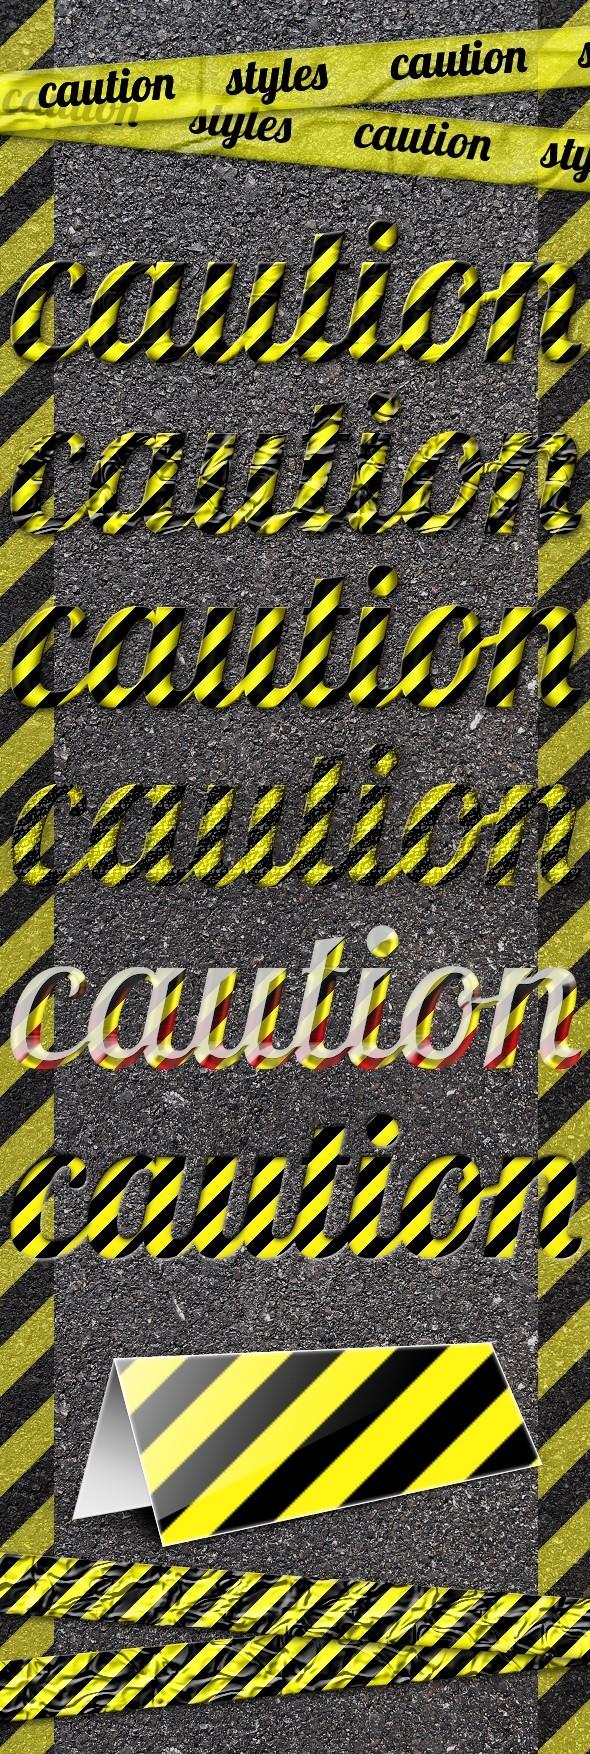 Caution Styles